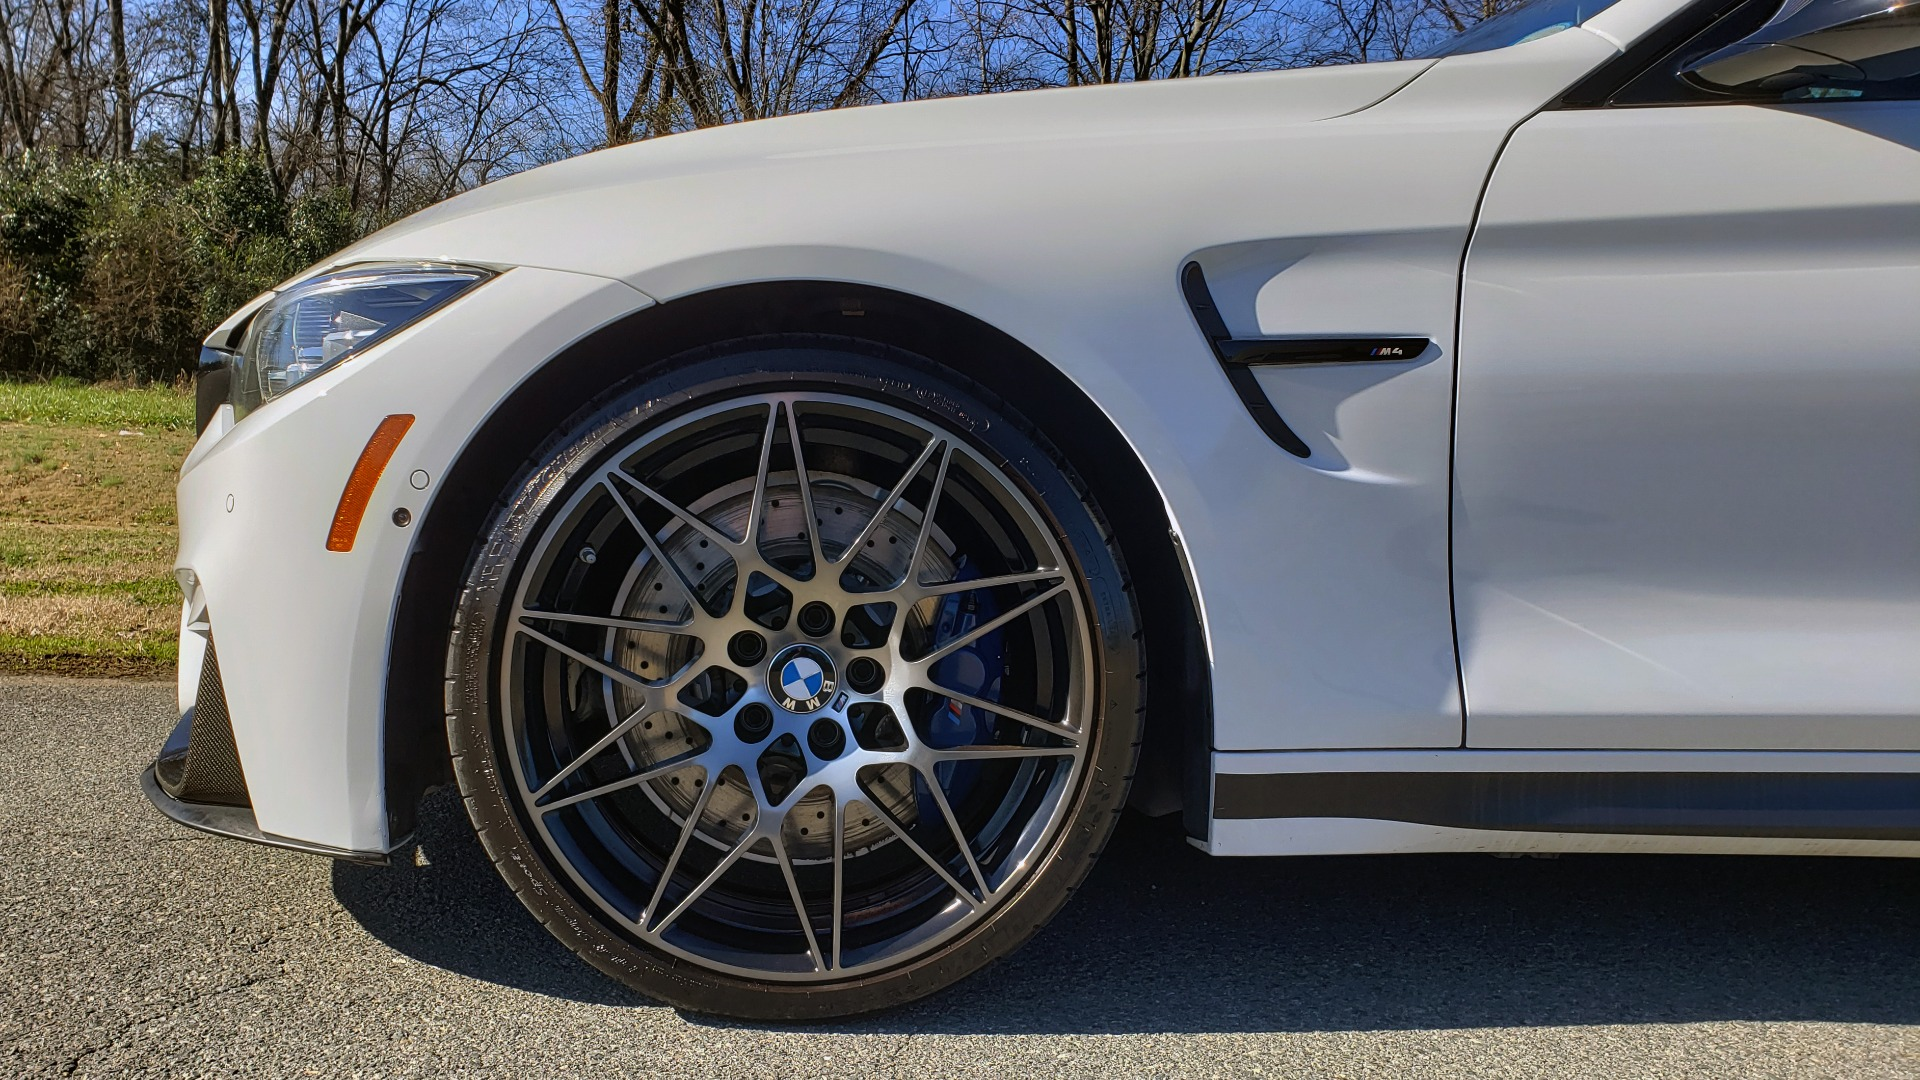 Used 2018 BMW M4 COMP PKG / EXEC / M-DRIVER / PARK CNTRL / ACTIVE BLIND SPOT for sale $45,449 at Formula Imports in Charlotte NC 28227 74